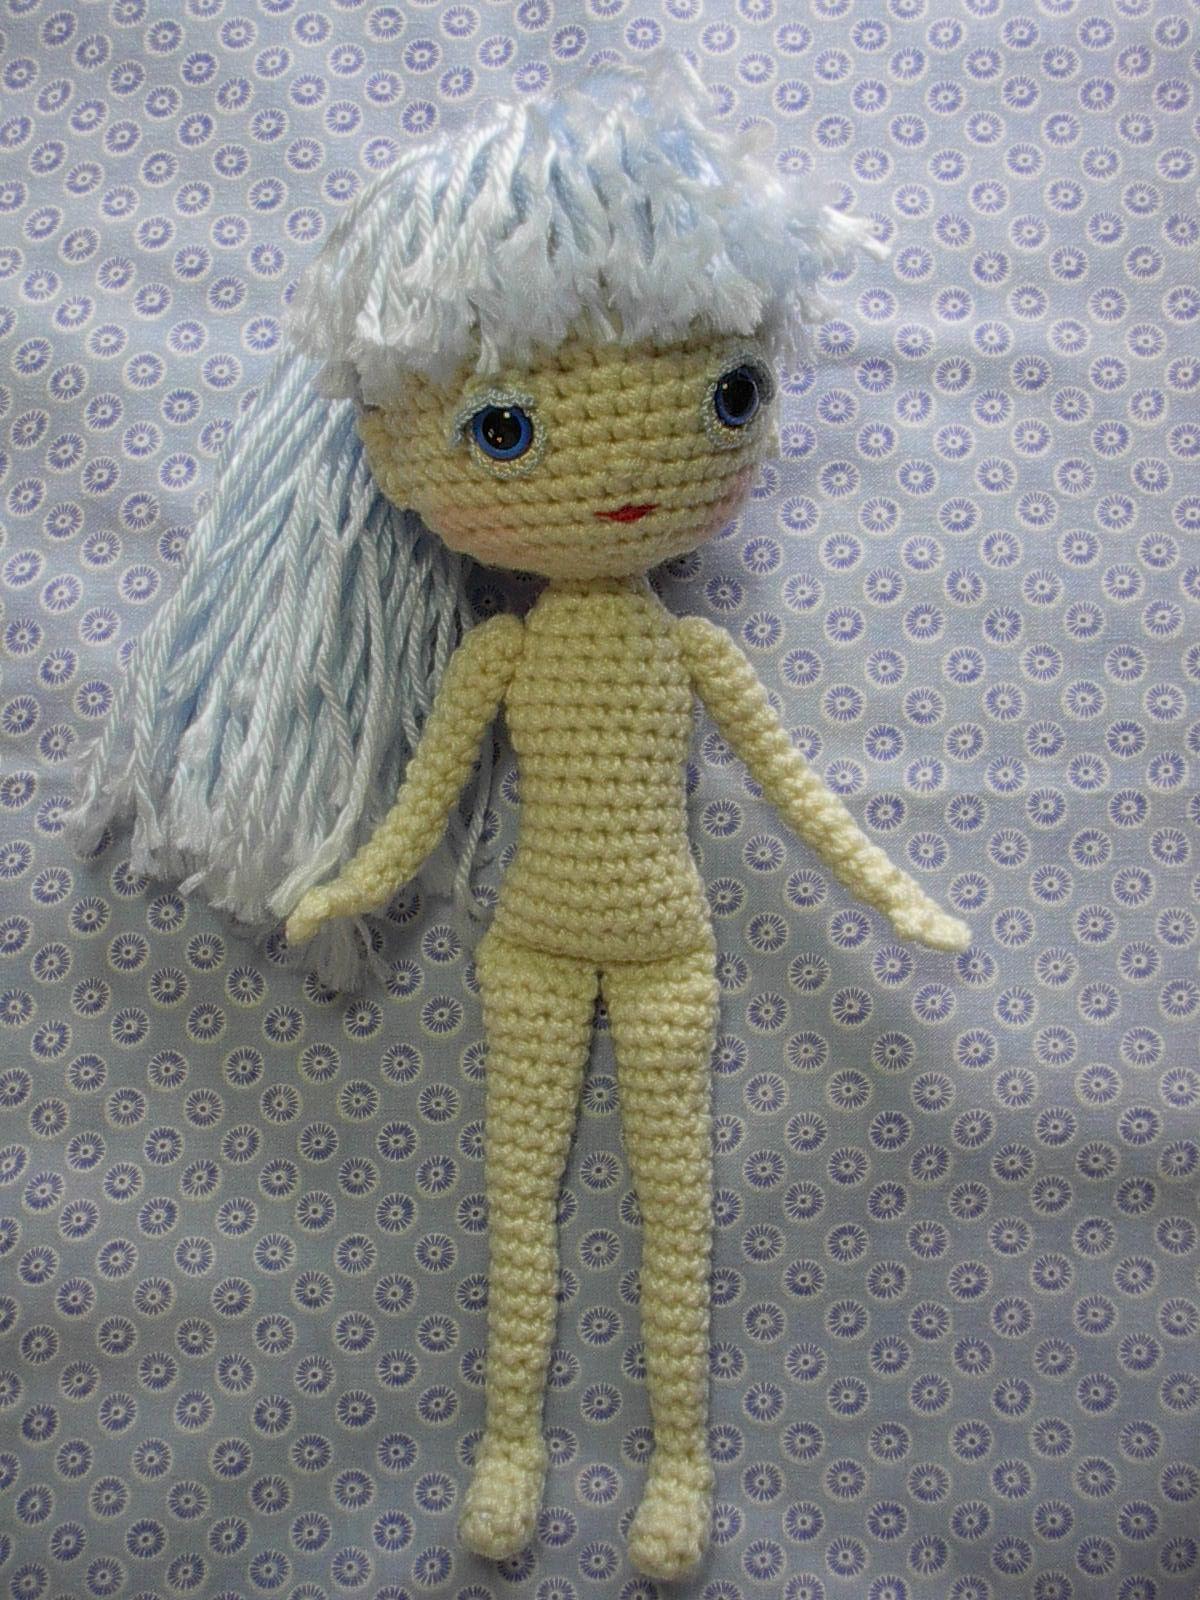 Molly Crocheted Amigurumi Doll [FREE Crochet Pattern] | 1600x1200